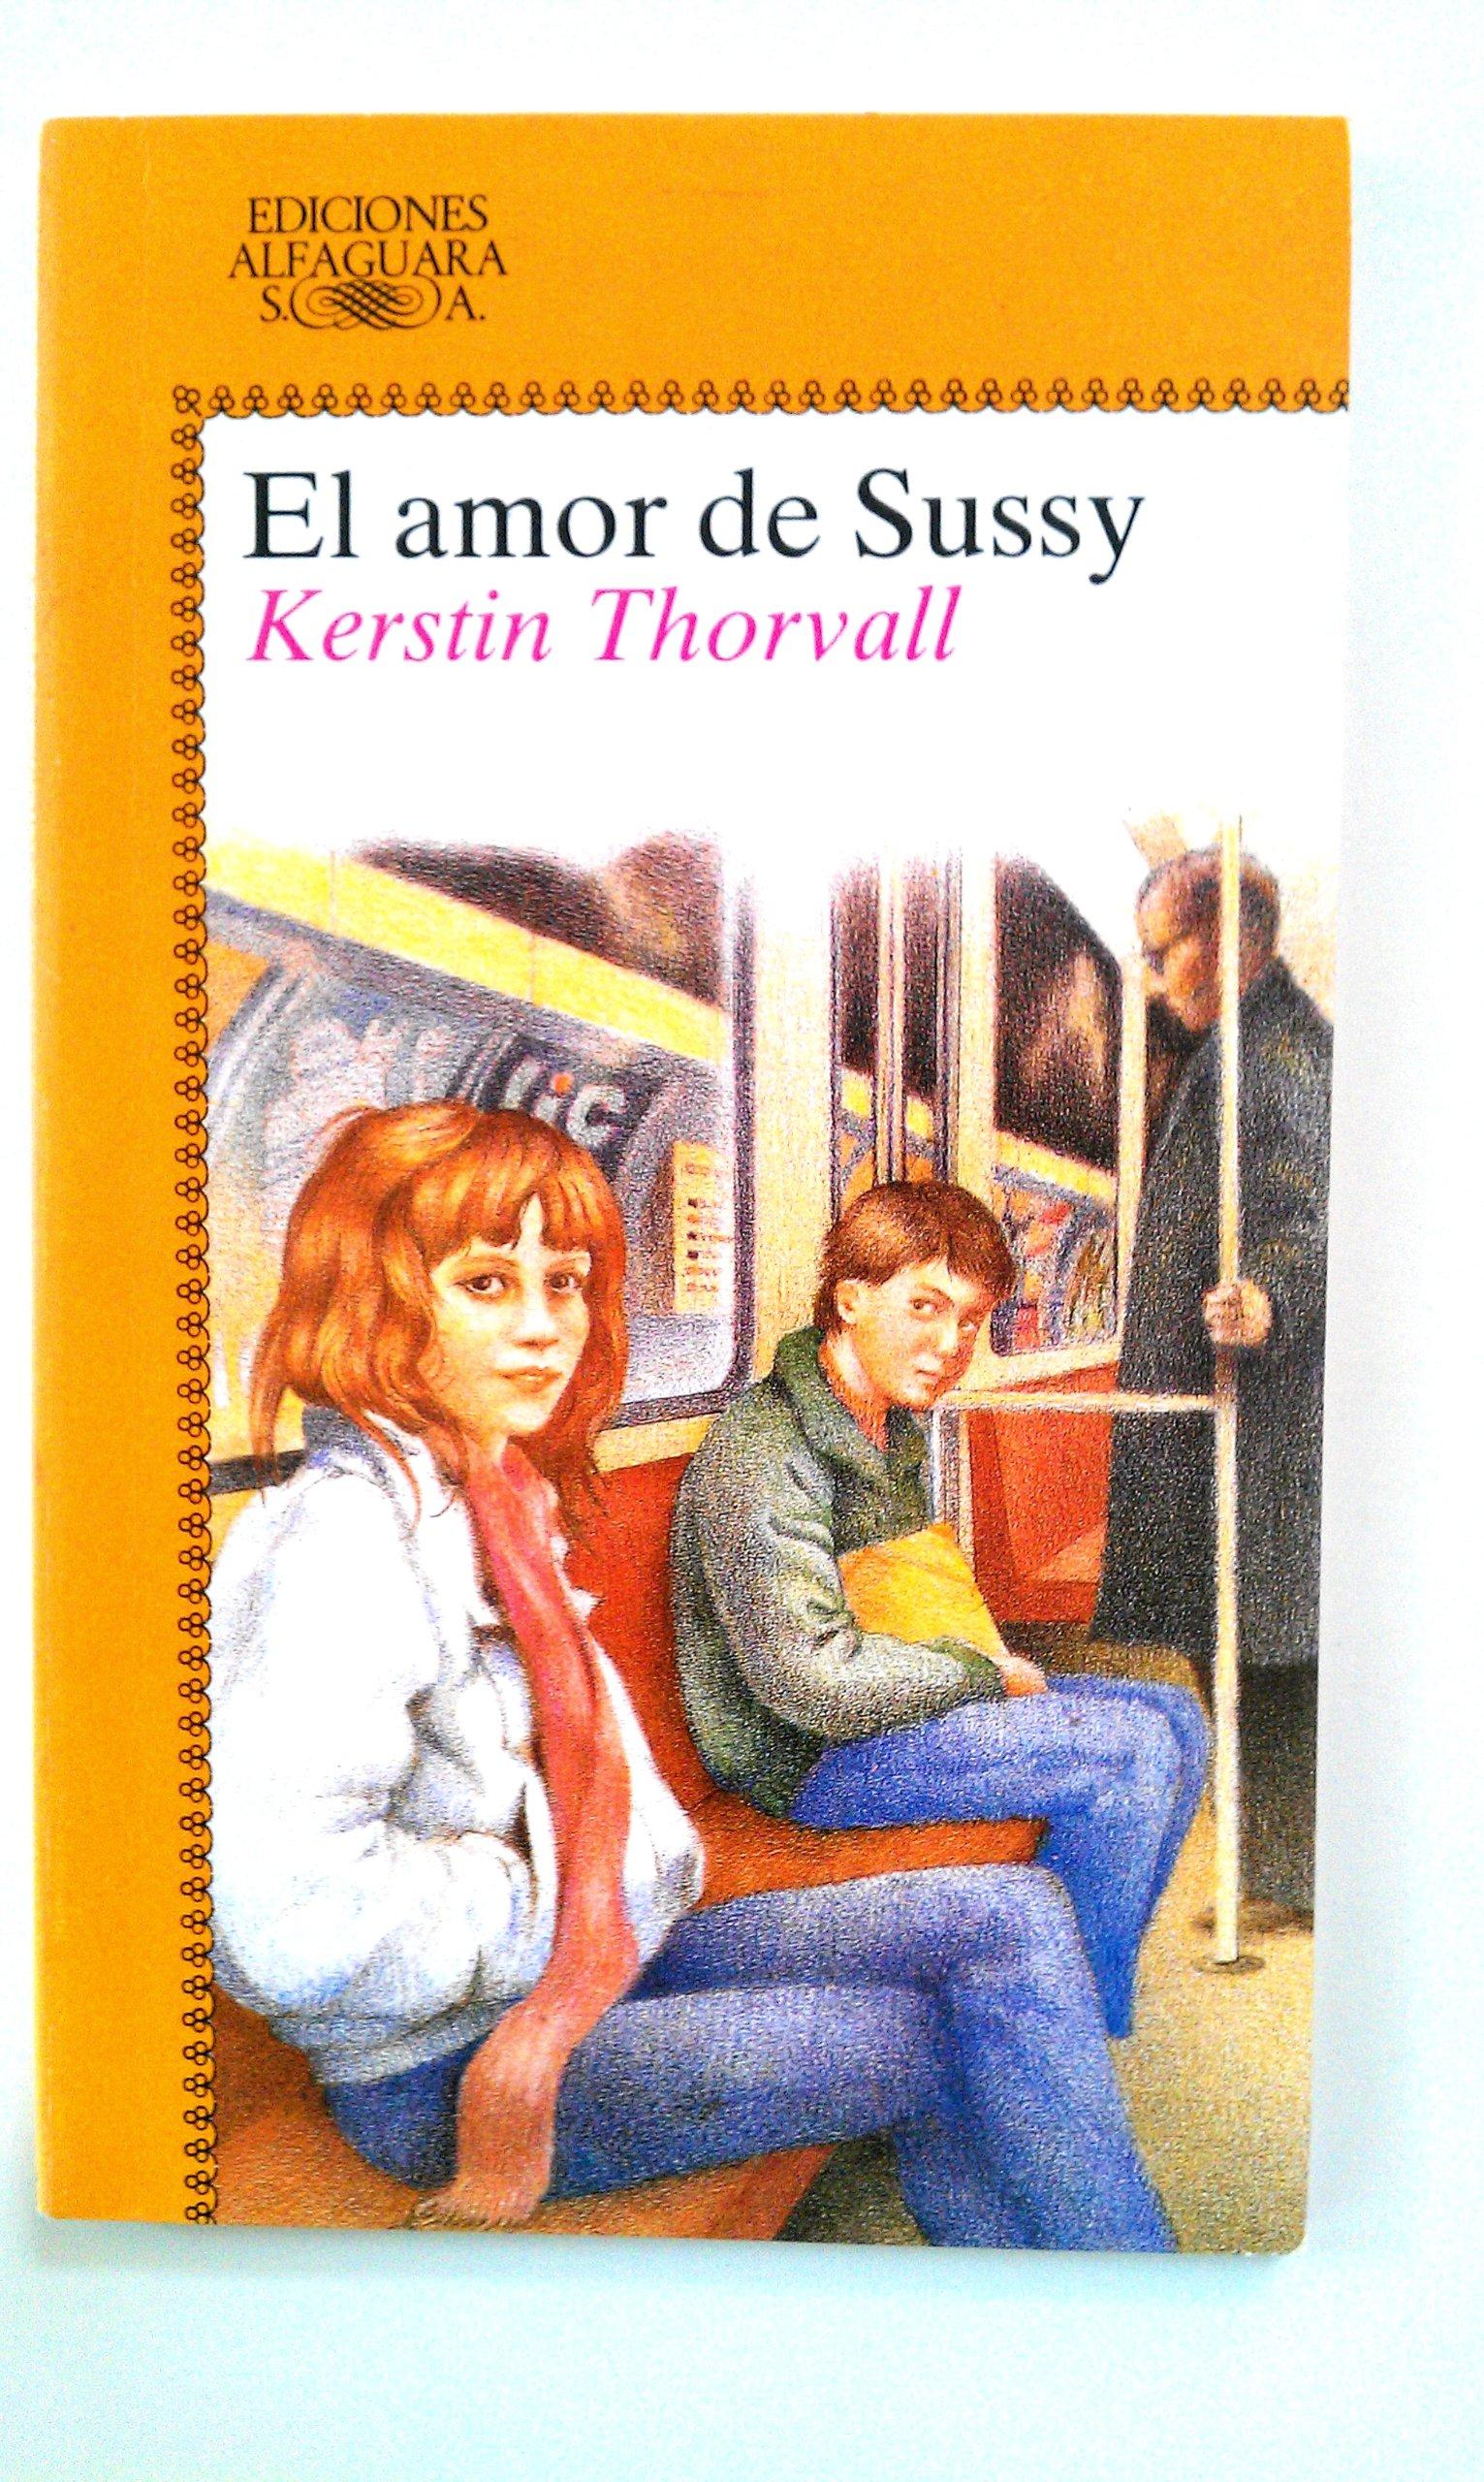 Amor de sussy, el (Alfaguara Juvenil): Amazon.es: Kerstin Thorvall: Libros